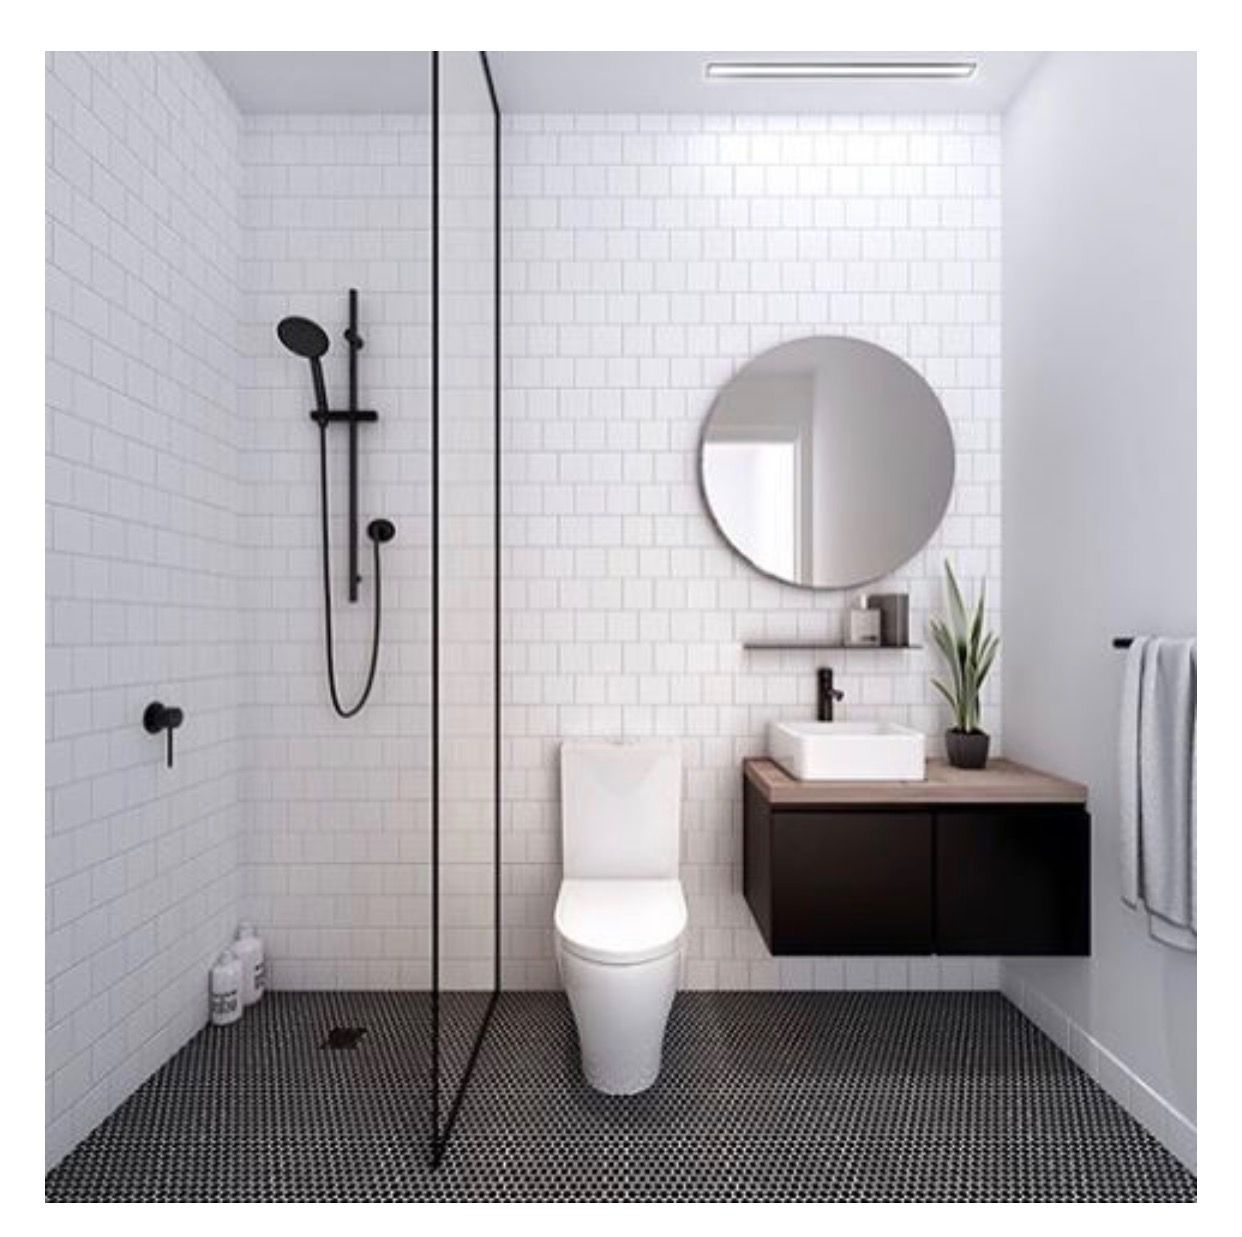 Pin By Stephanie Gleeson On Toiletd: Pin By Stephanie Tripp On Interior Design Inspiration